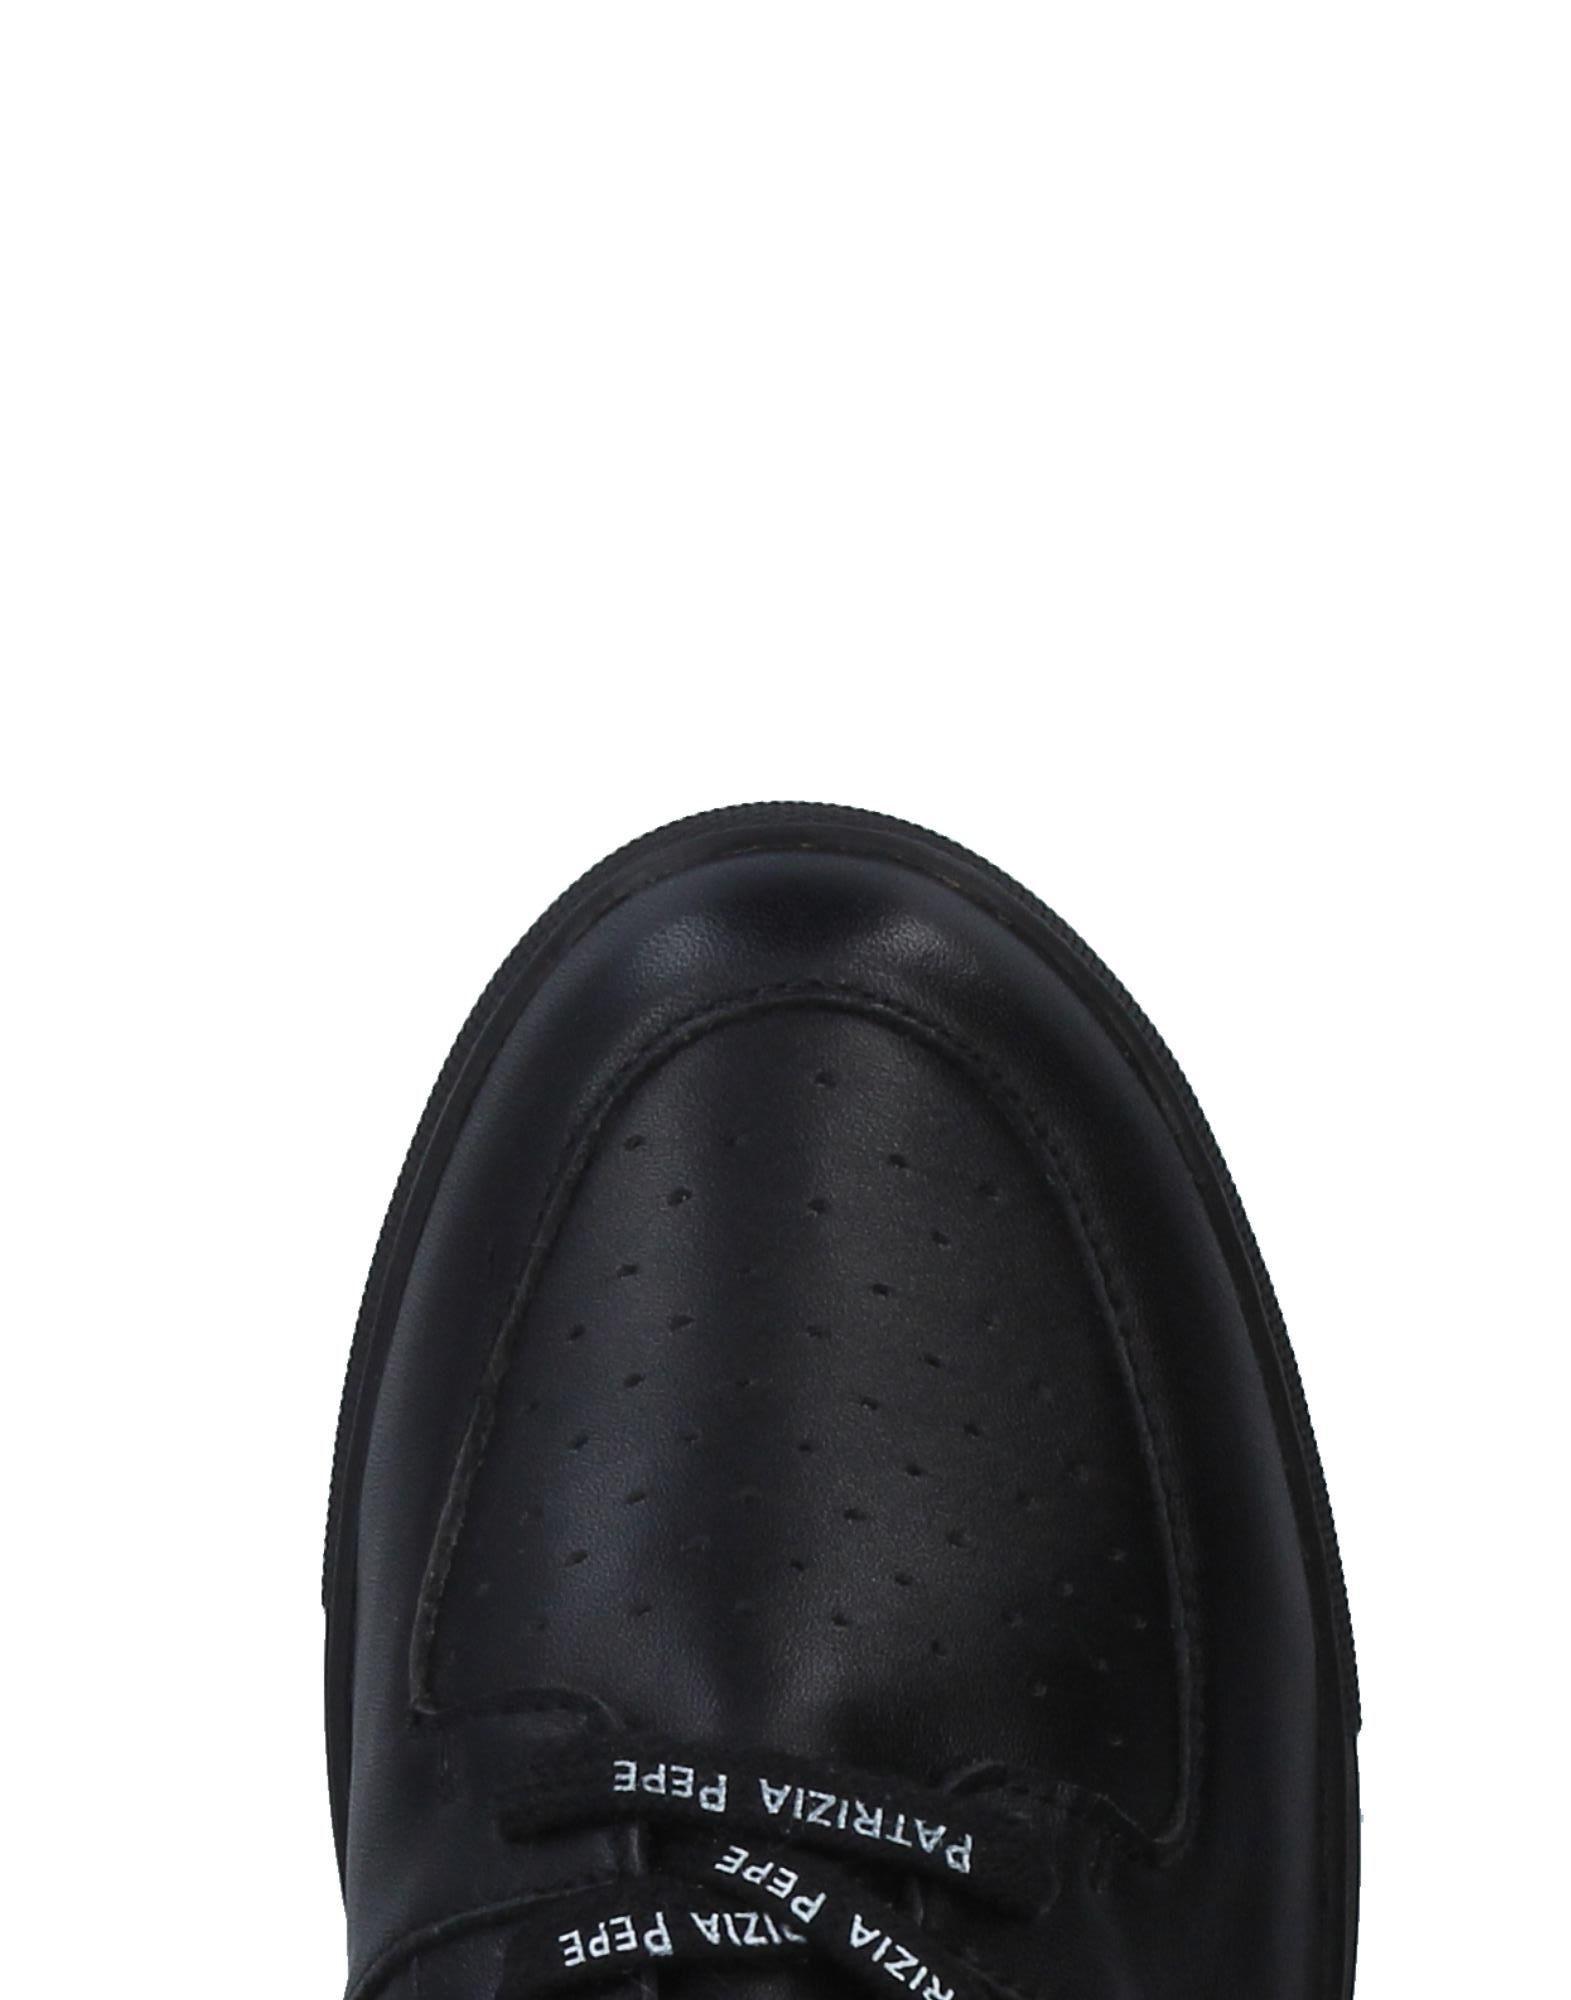 Stilvolle Pepe billige Schuhe Patrizia Pepe Stilvolle Sneakers Damen  11369994VA 577e4f